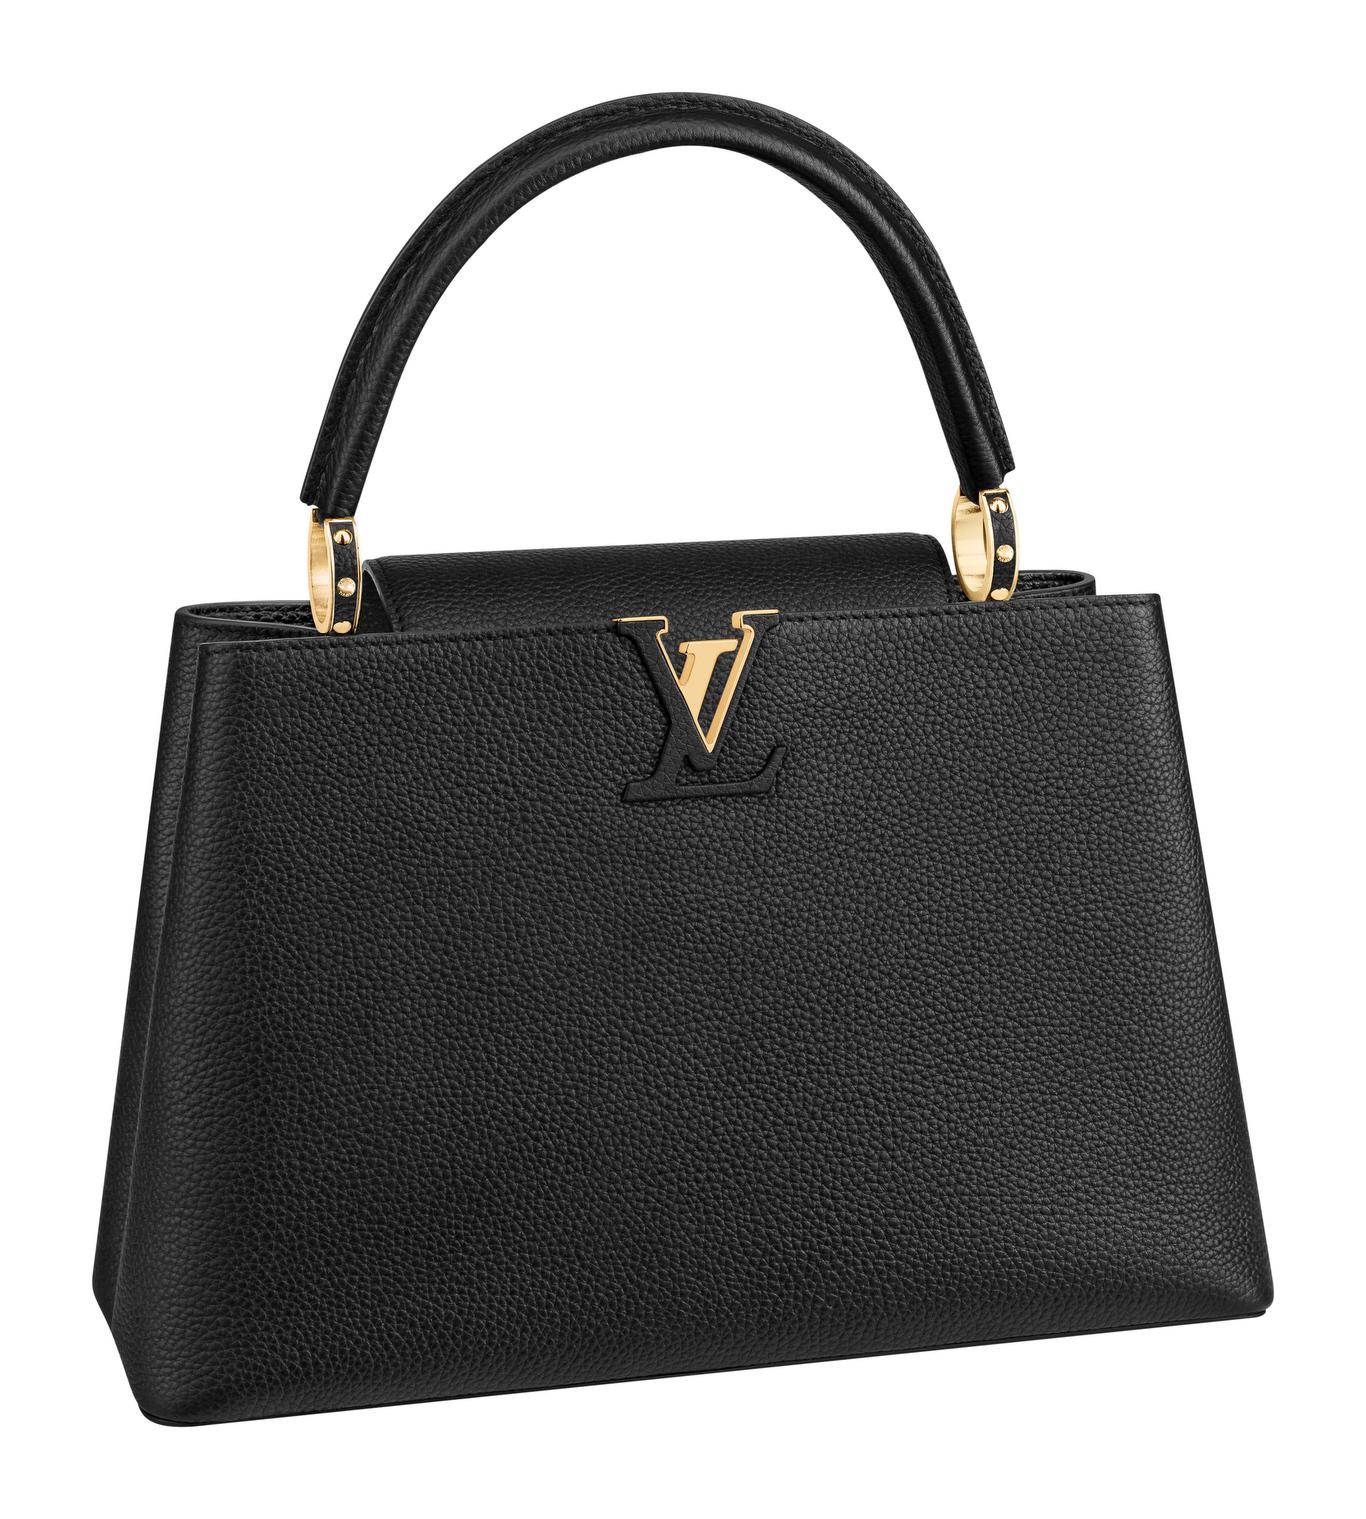 Louis VuittonÕs Capucines bag